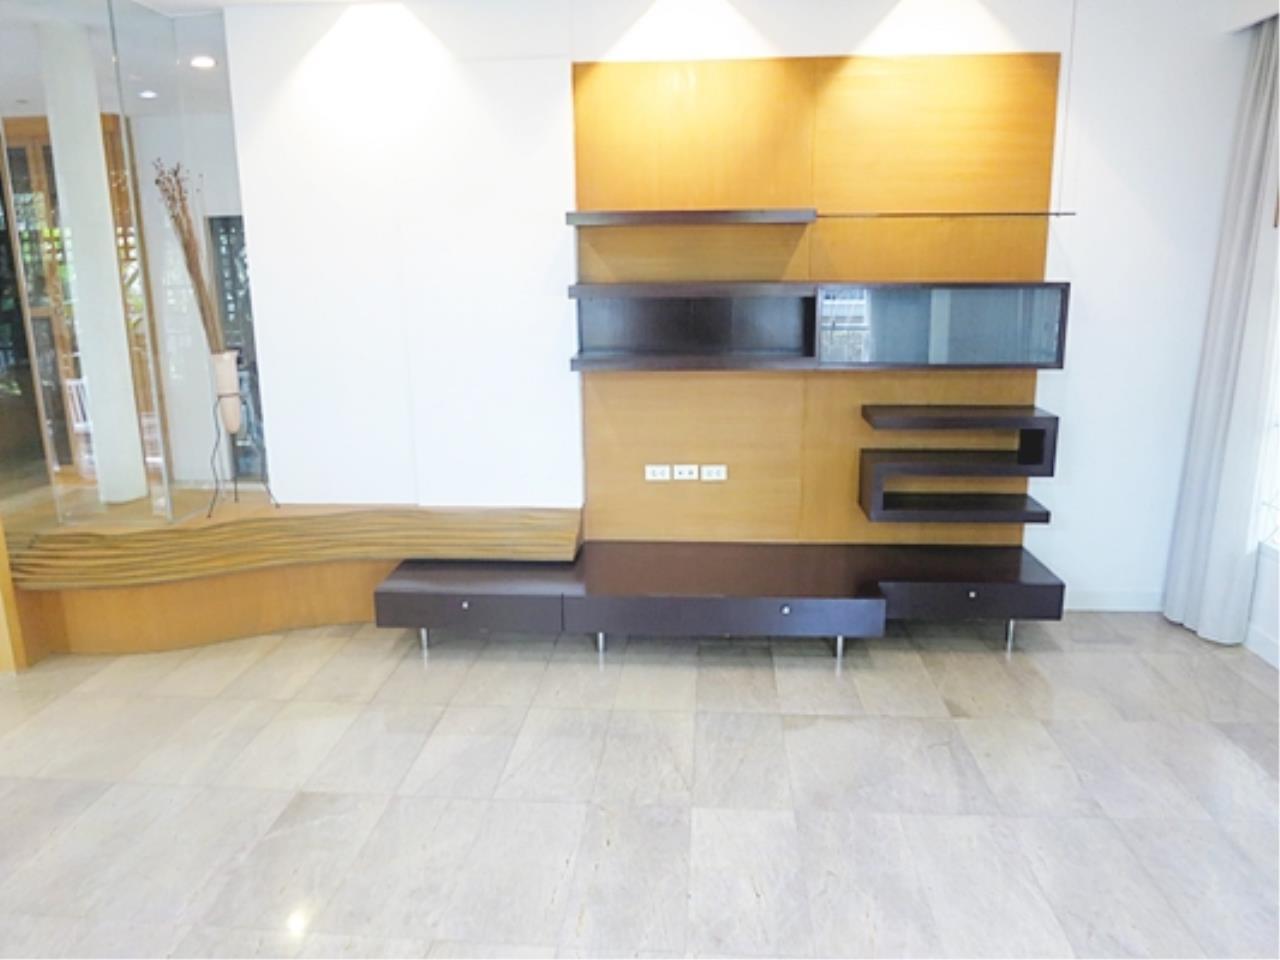 Estate Corner Agency (Samut Prakan) Agency's Single house for sale Ladprao, fully furnished. 11